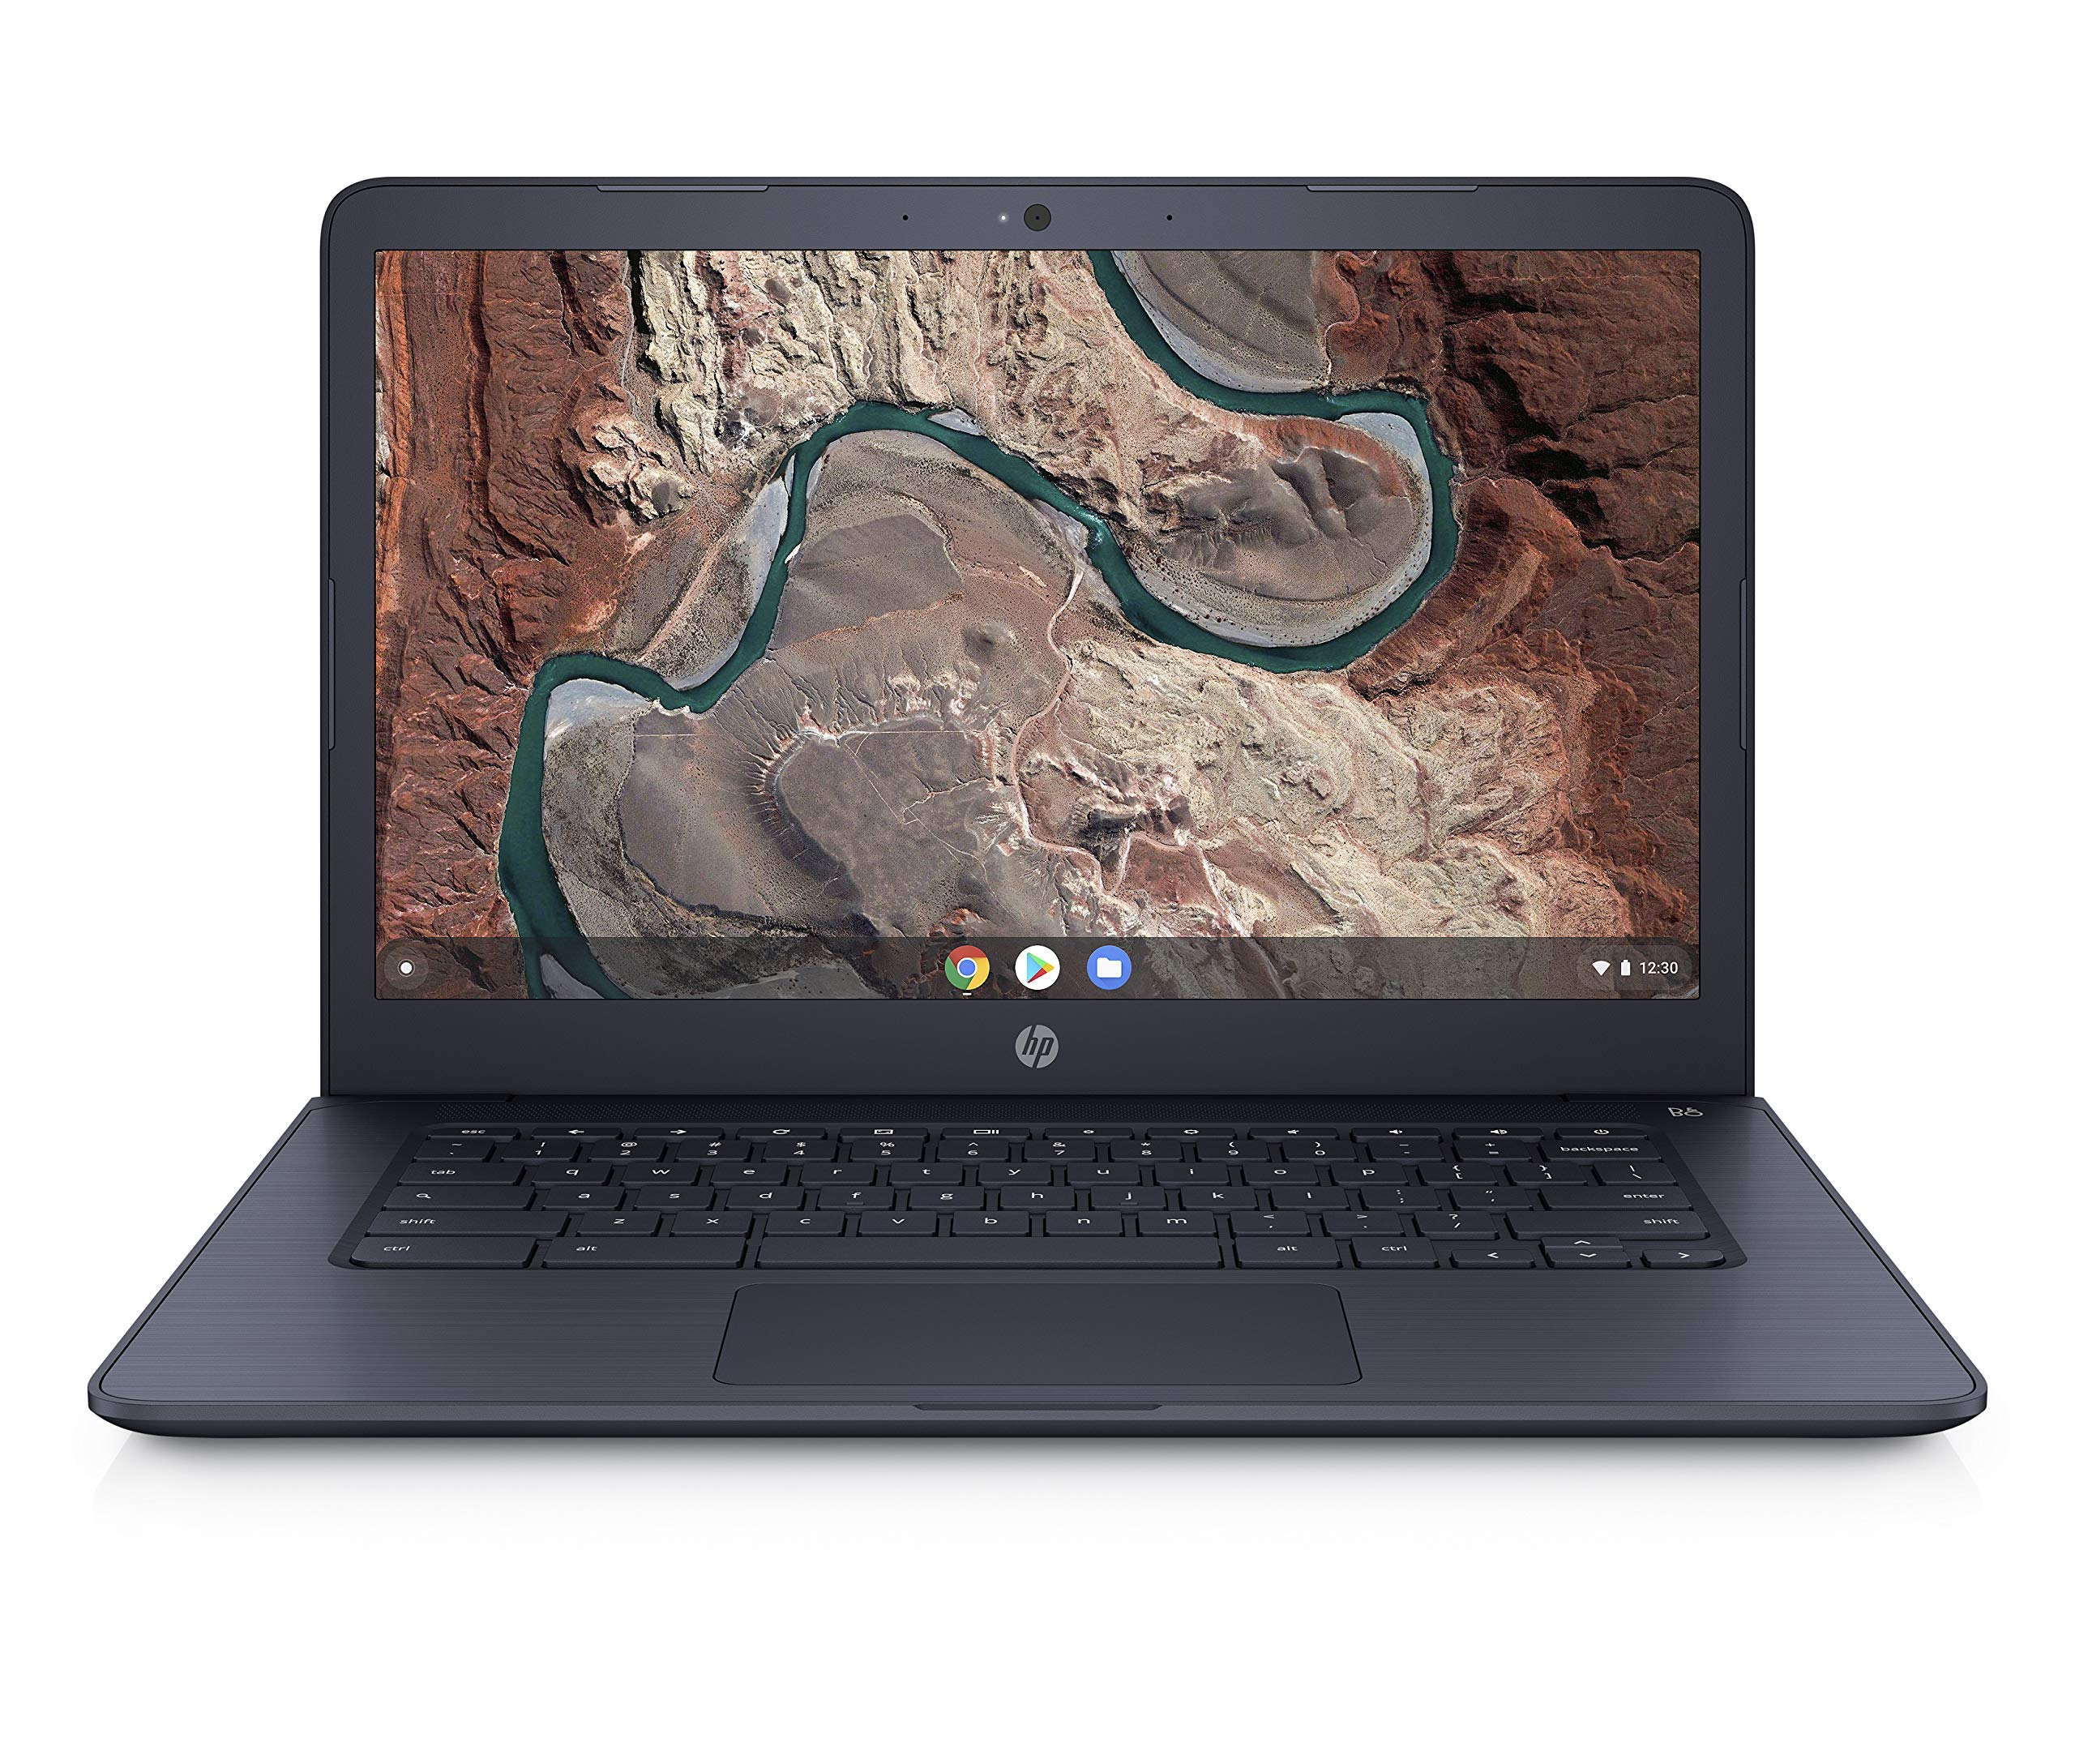 HP 14inch FHD(1920X1080) IPS Chromebook AMD Dual-Core A4-9120C Processor, 4GB DDR4 Memory, 32GB eMMC Storage, AMD Radeon R4 Graphics, Chrome OS- (Renewed) by HP